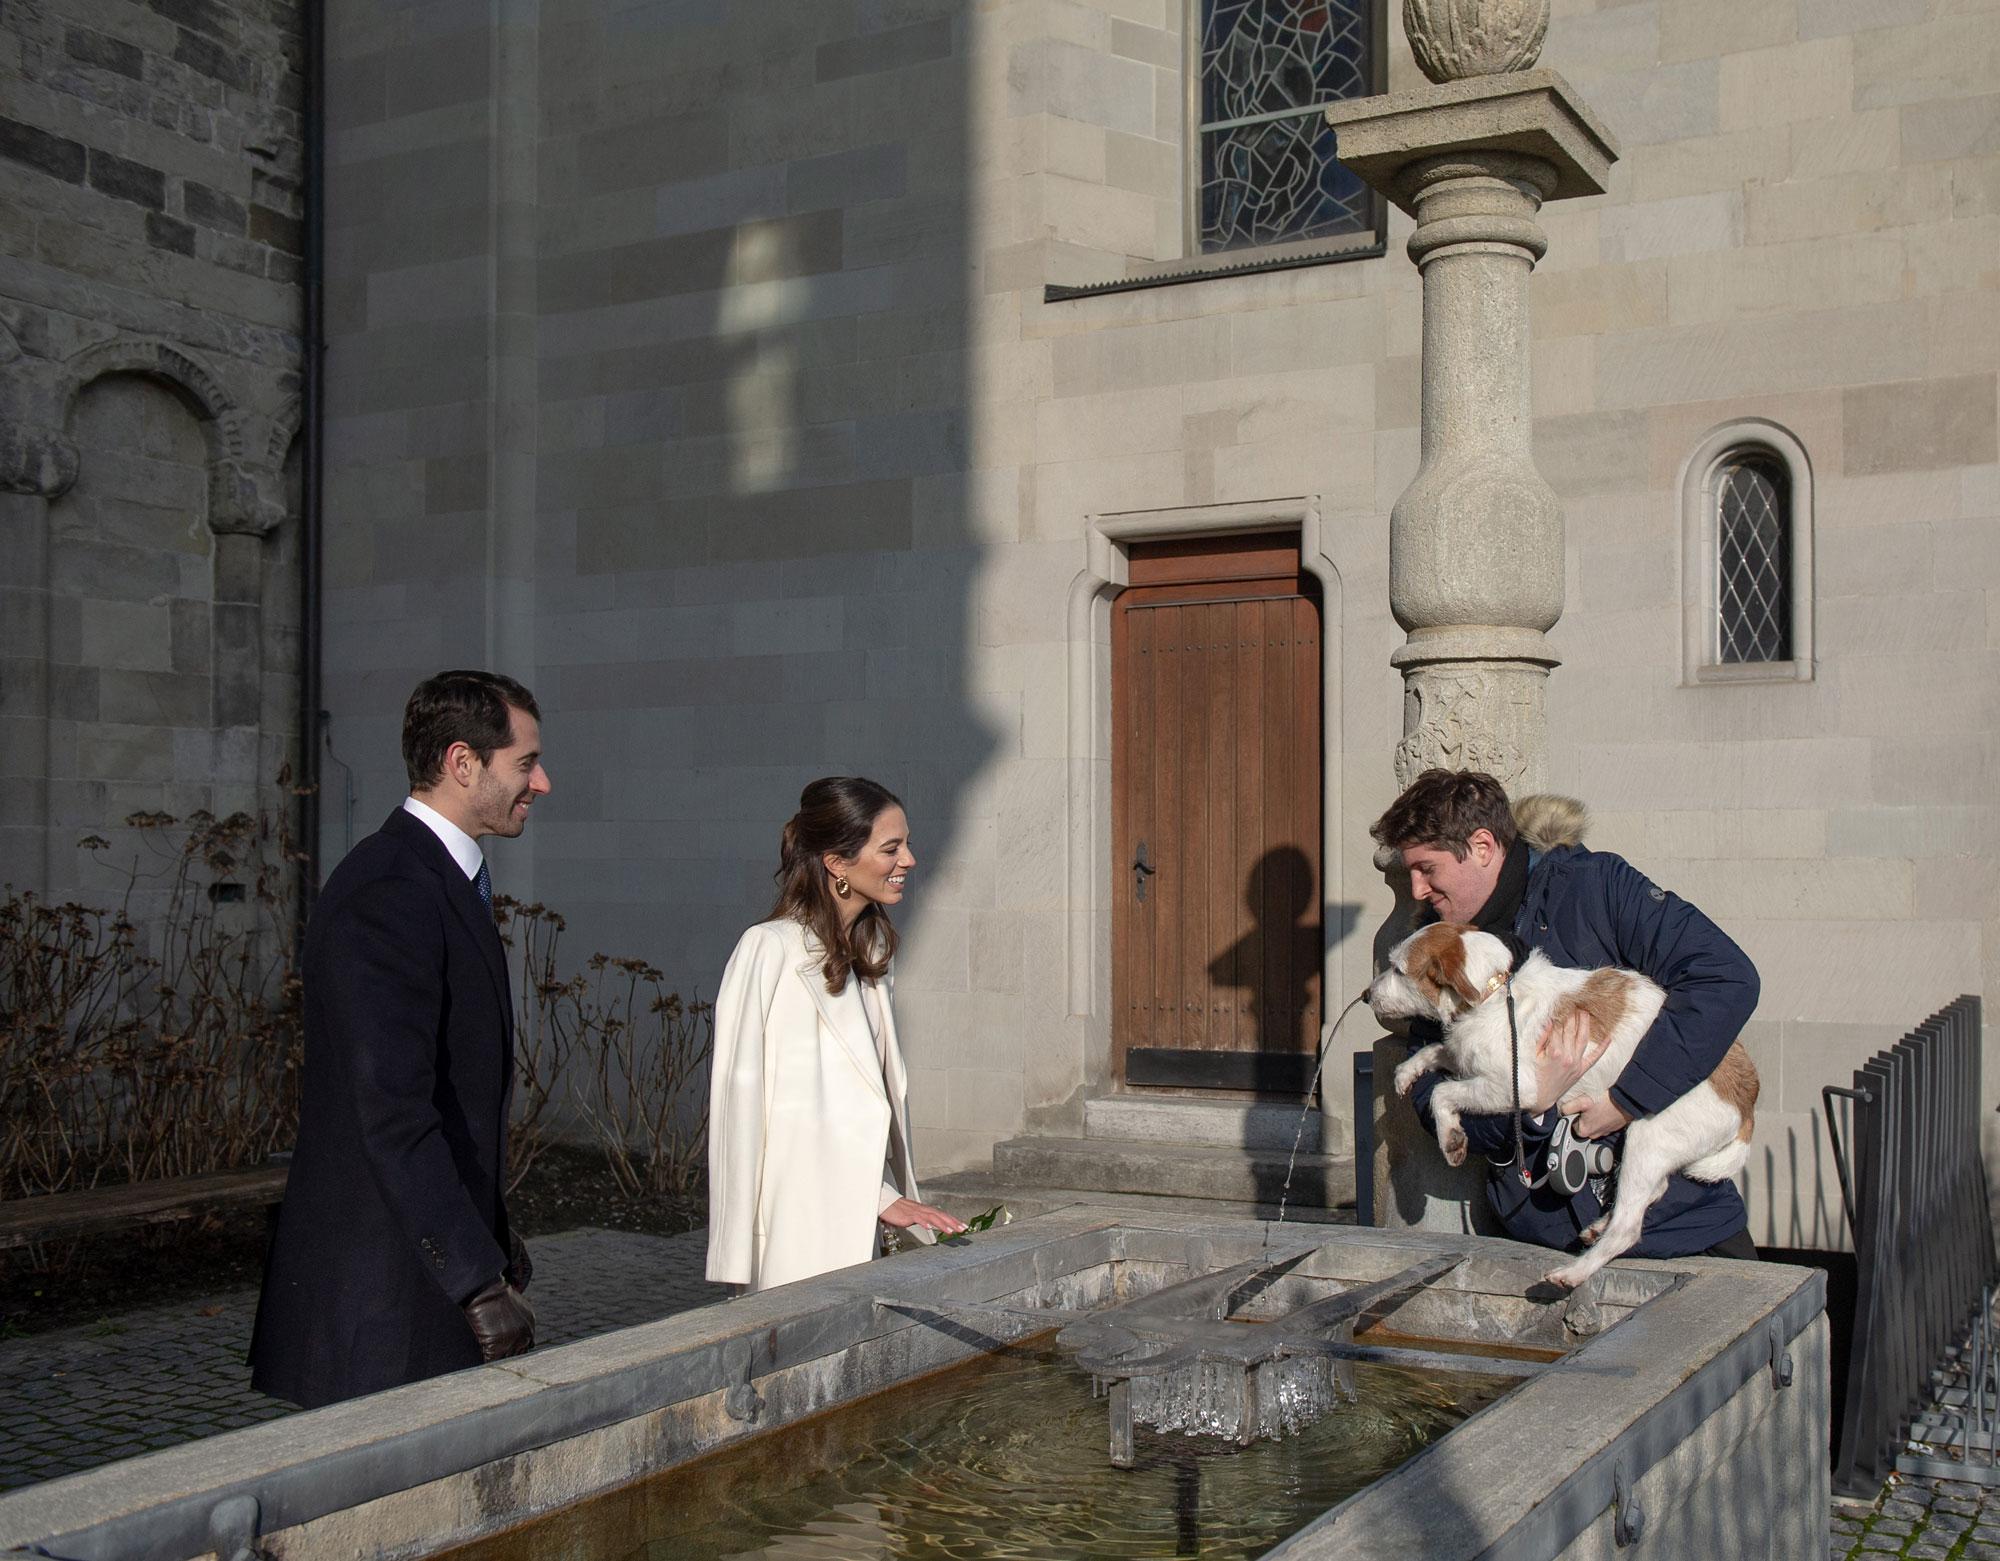 juliana-cosimo-stadthaus-wedding-14.jpg